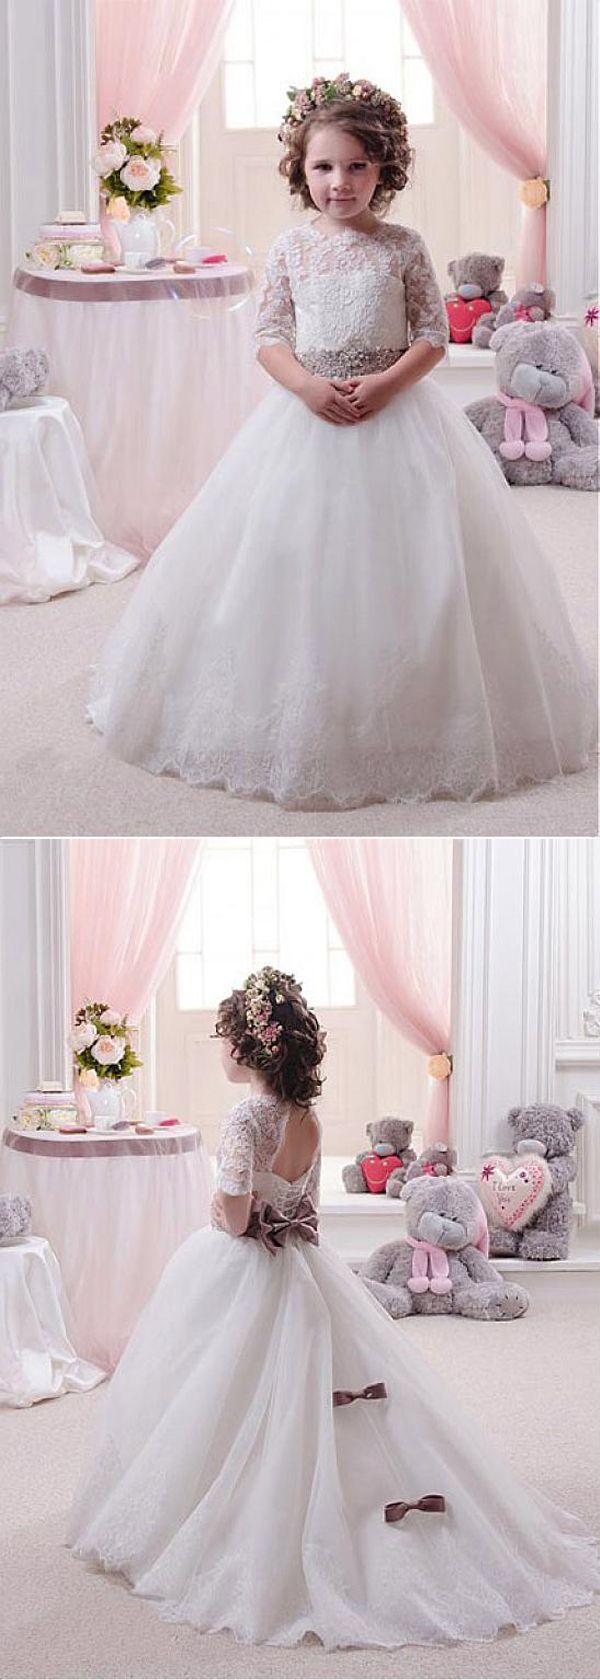 Charming tulle u satin jewel neckline ball gown flower girl dresses